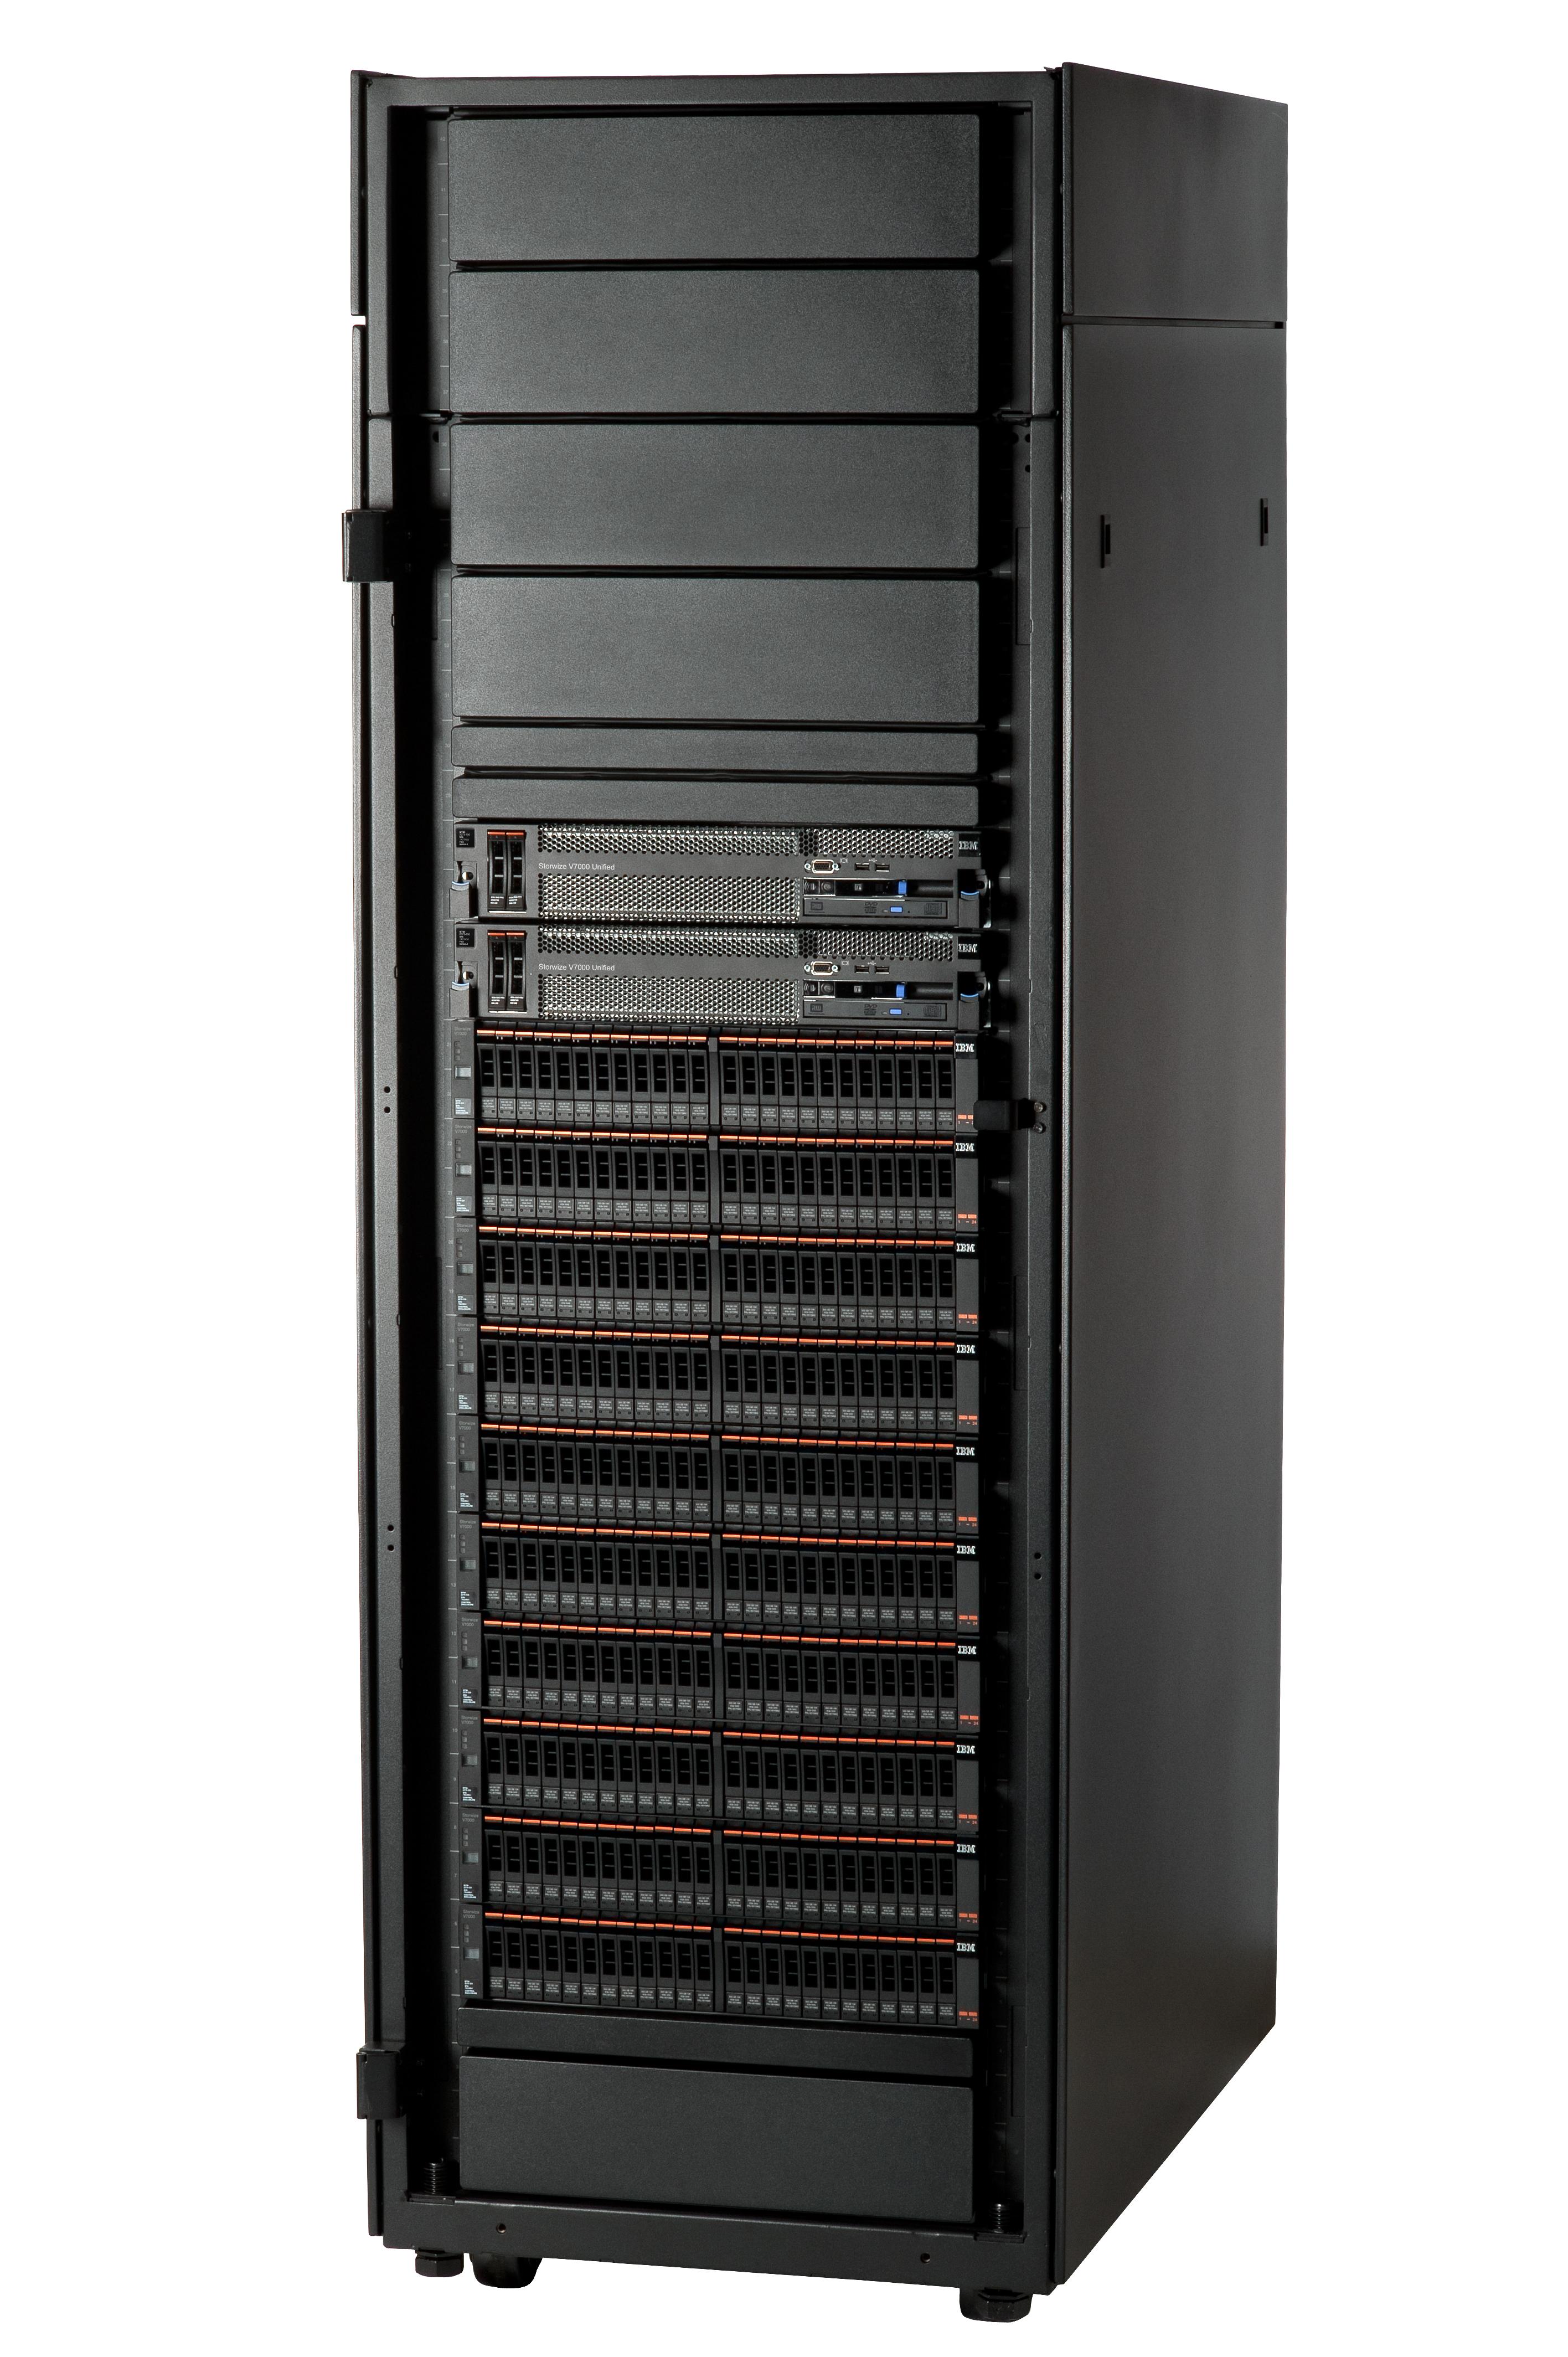 Ibm Storwize V7000 Unified Sico Systems